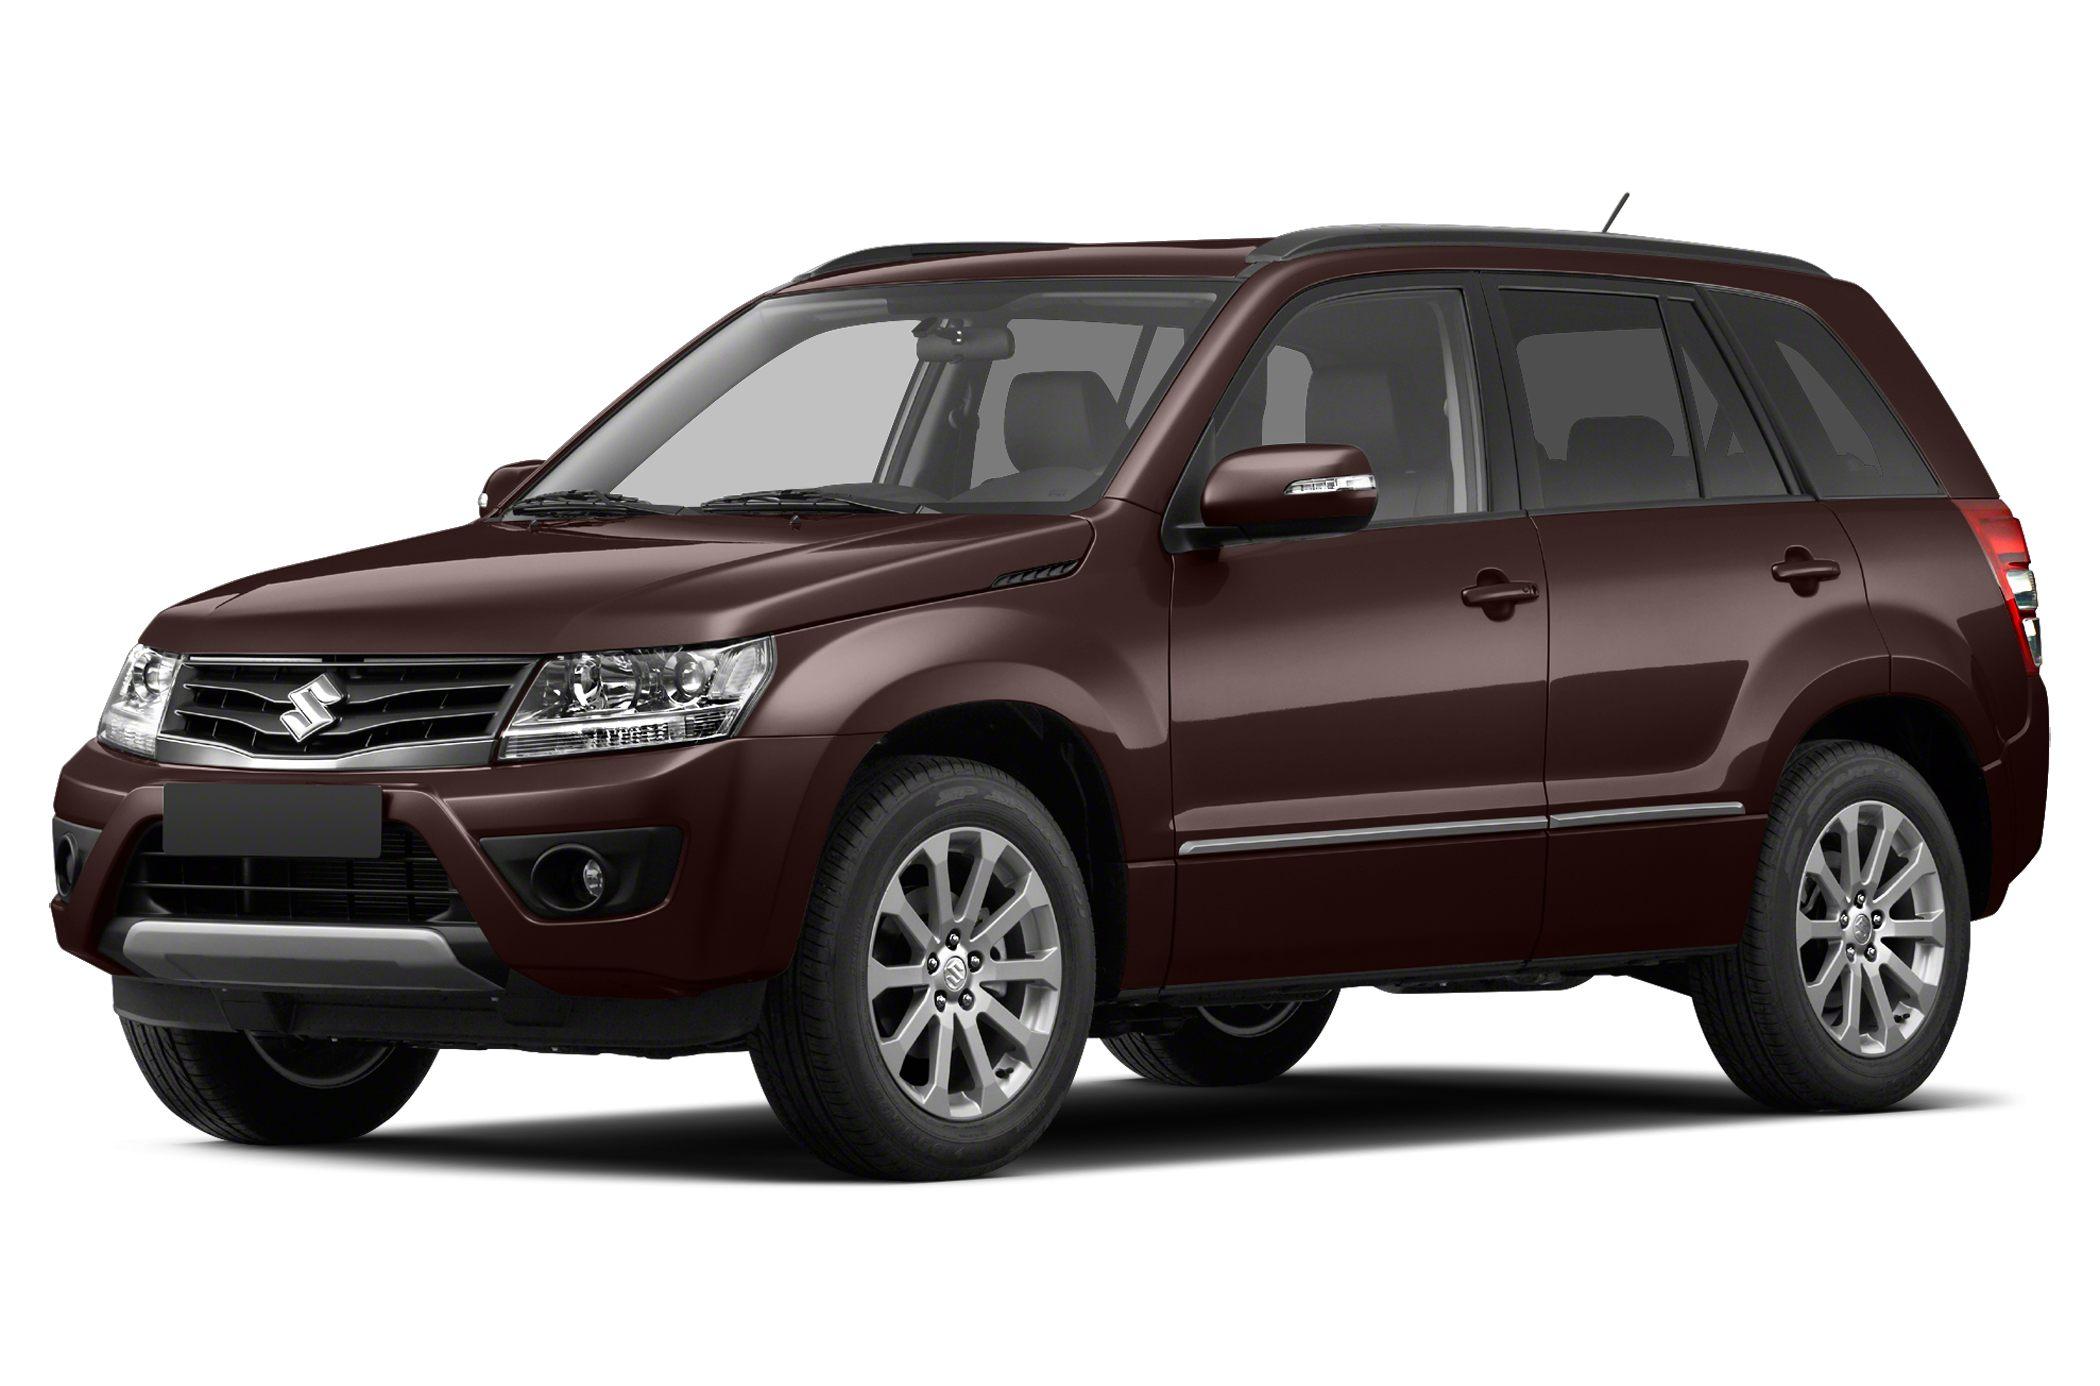 2013 Suzuki Grand Vitara Premium SUV for sale in Honolulu for $14,300 with 21,065 miles.